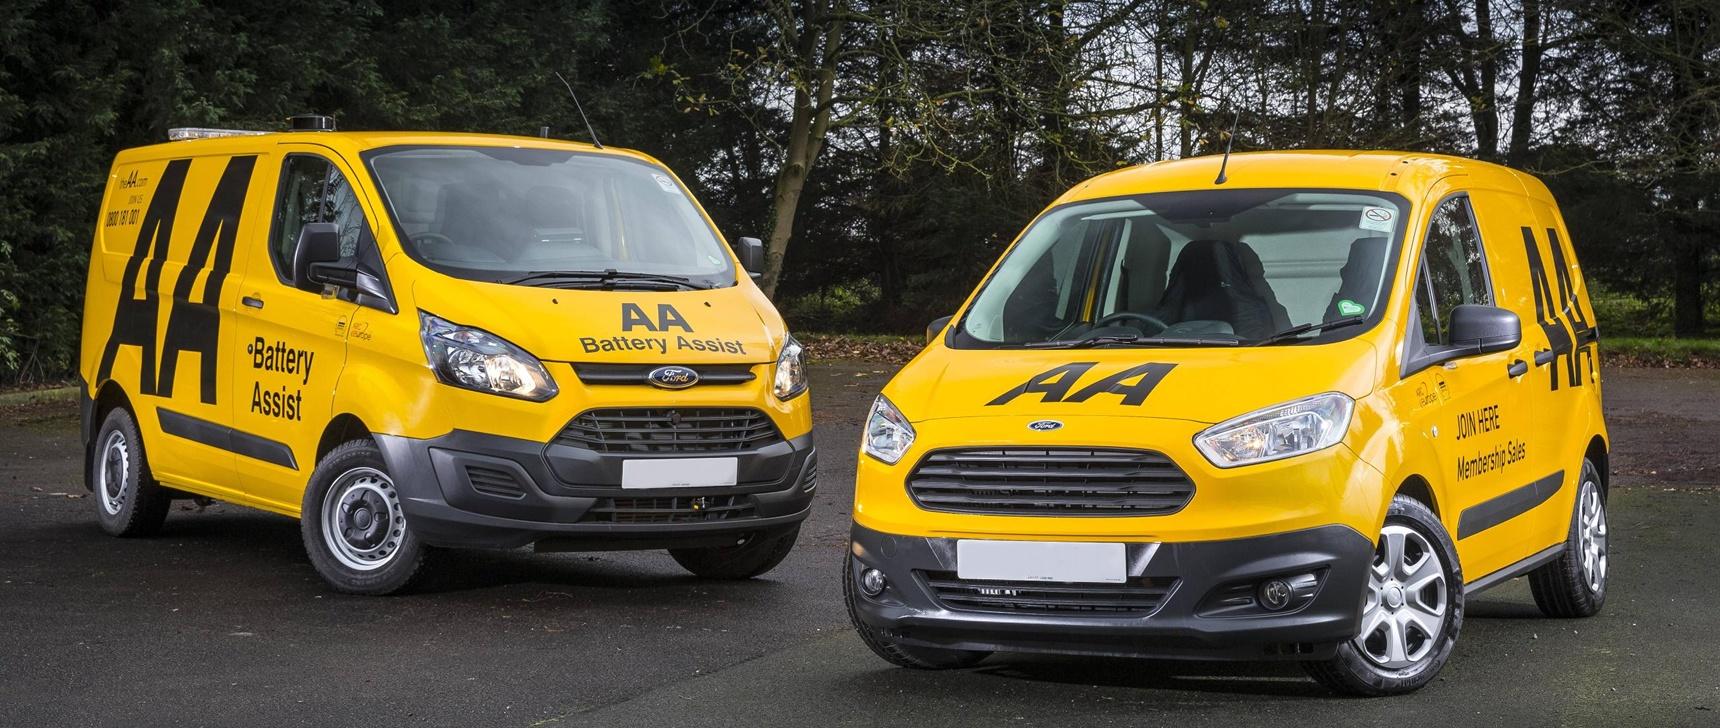 AA breakdown and Battery Assist vans